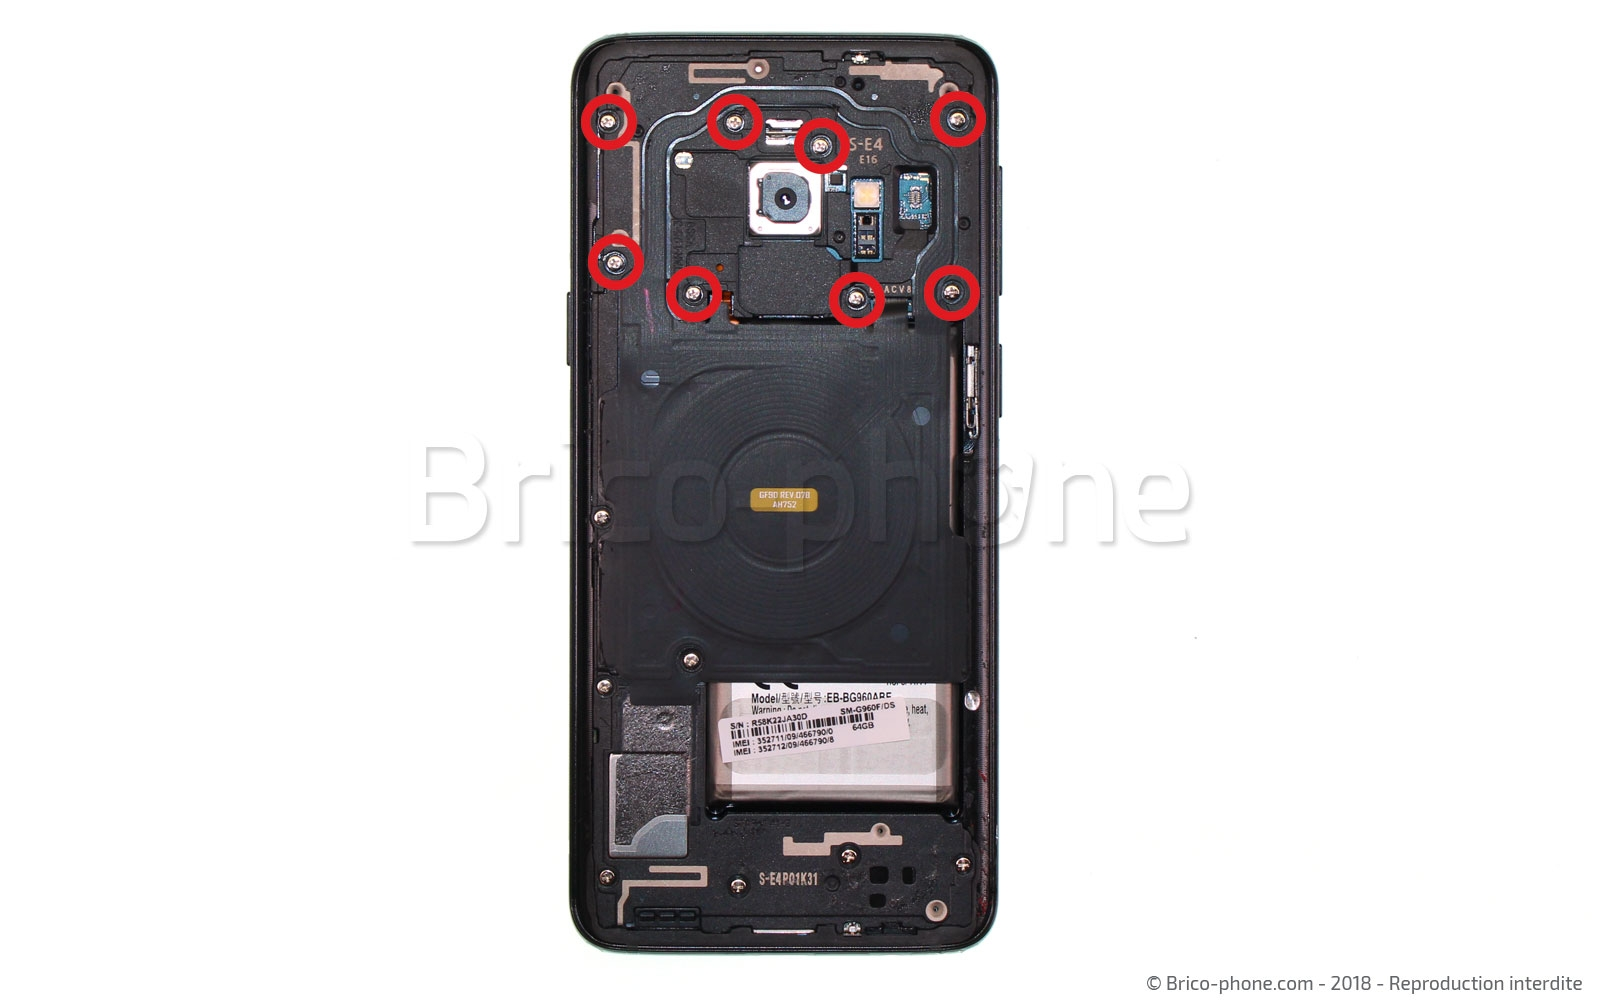 Etape 4 : Retirer la nappe NFC et son support